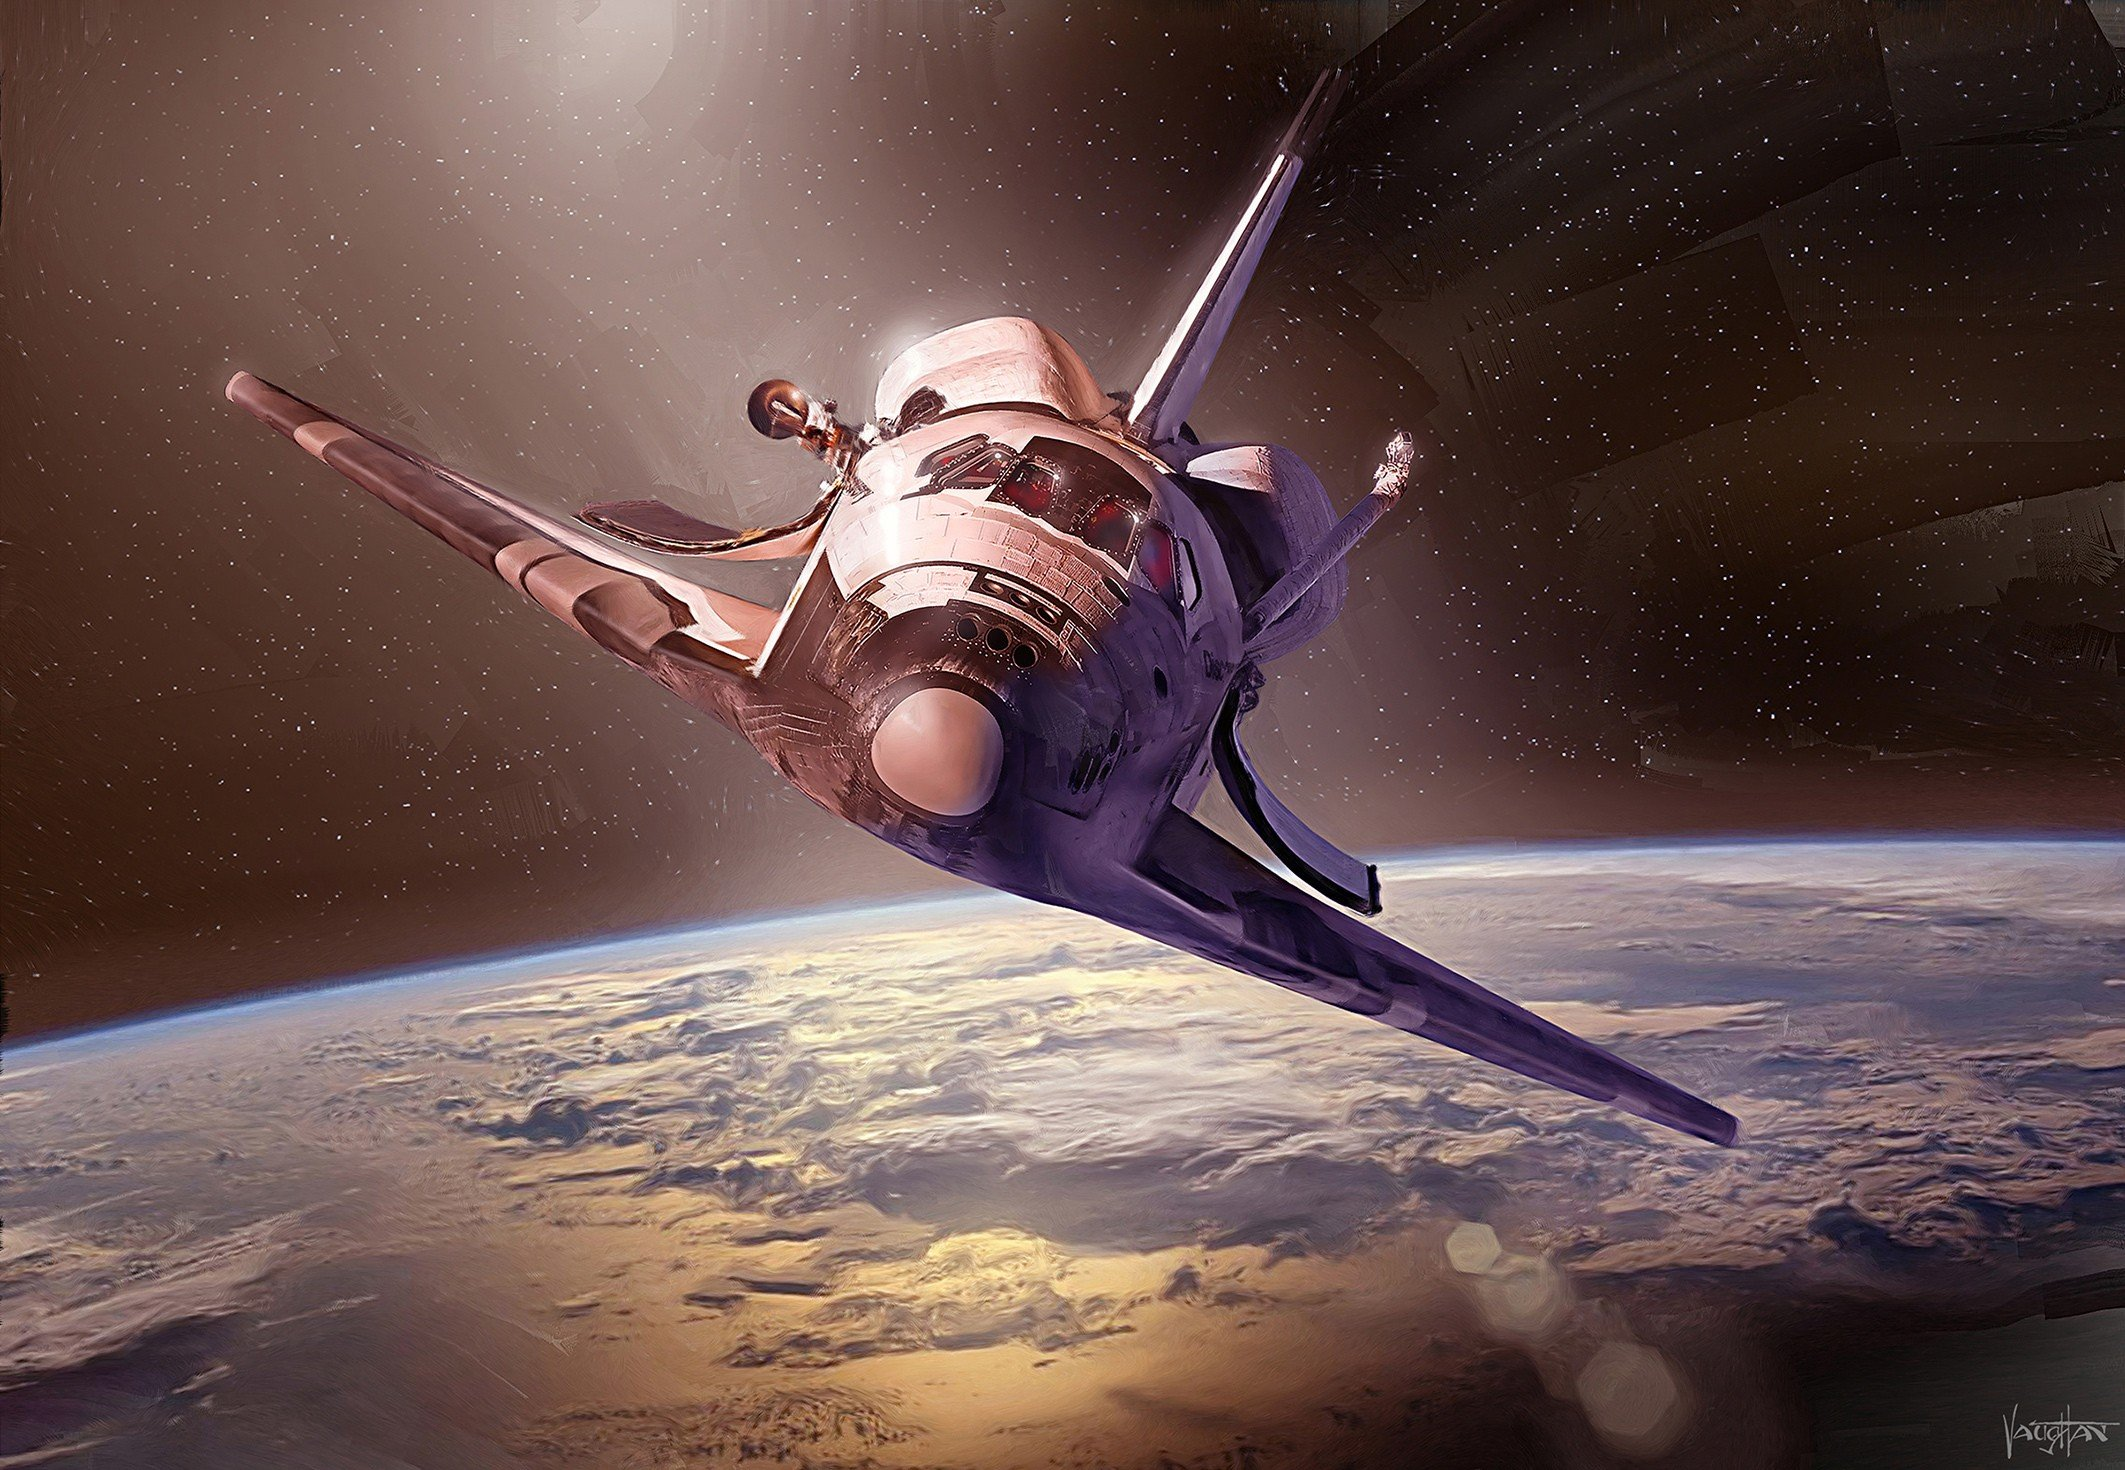 artwork, Space shuttle, Space, Digital art, Space art HD ...